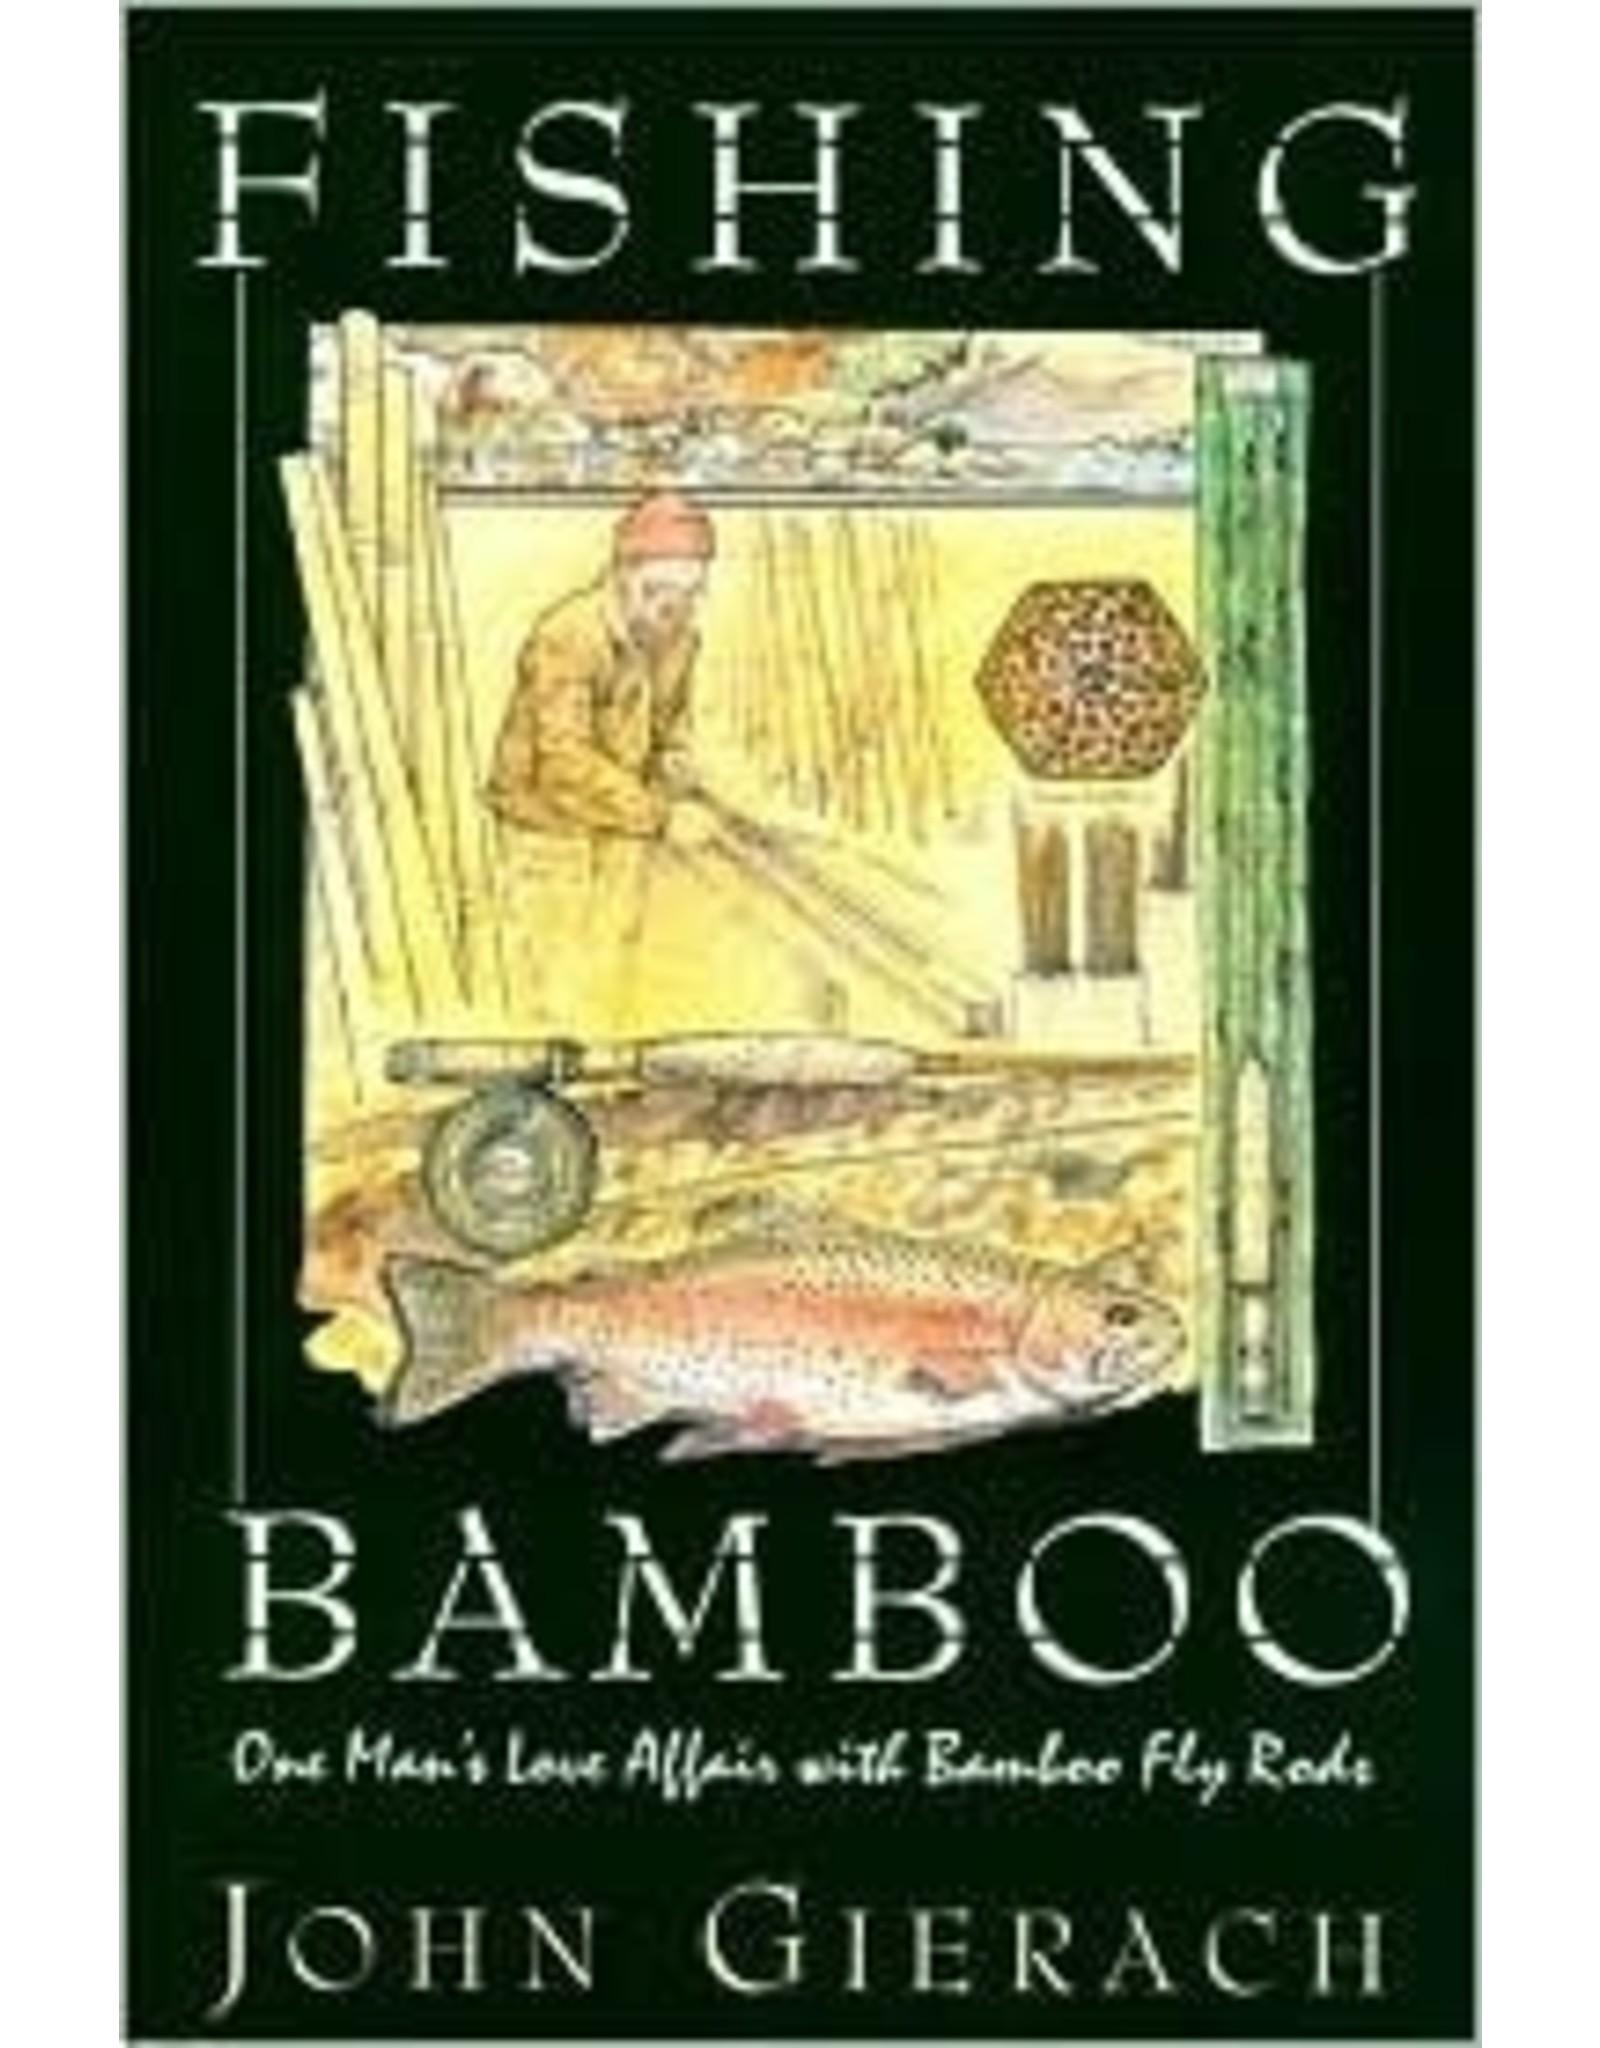 Books Fishing Bamboo by John Gierach